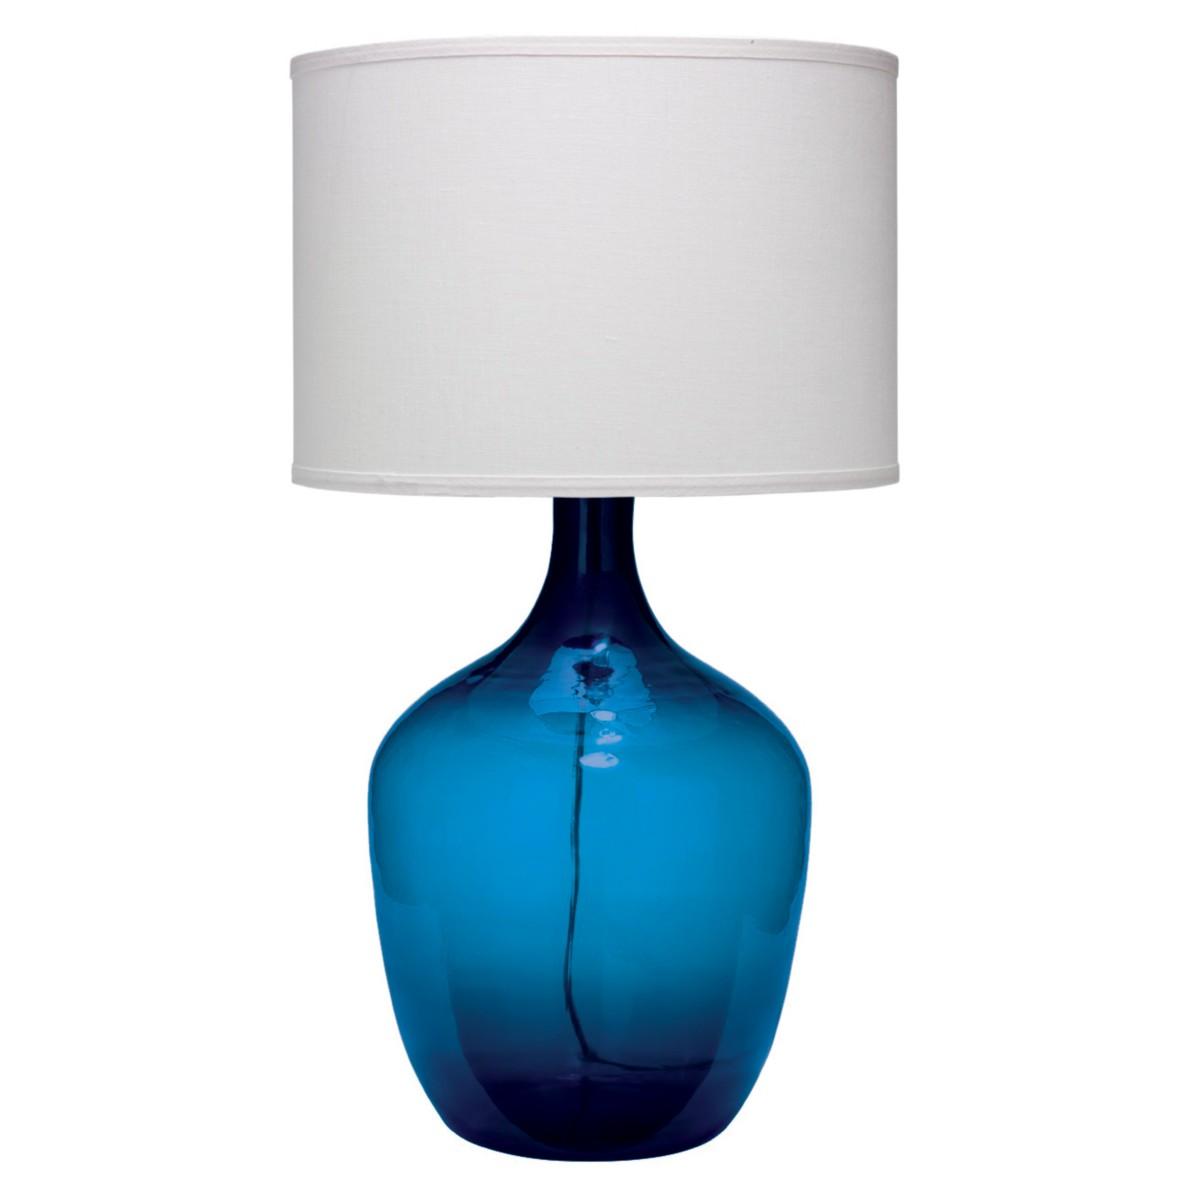 Plum Jar Table Lamp Extra Large